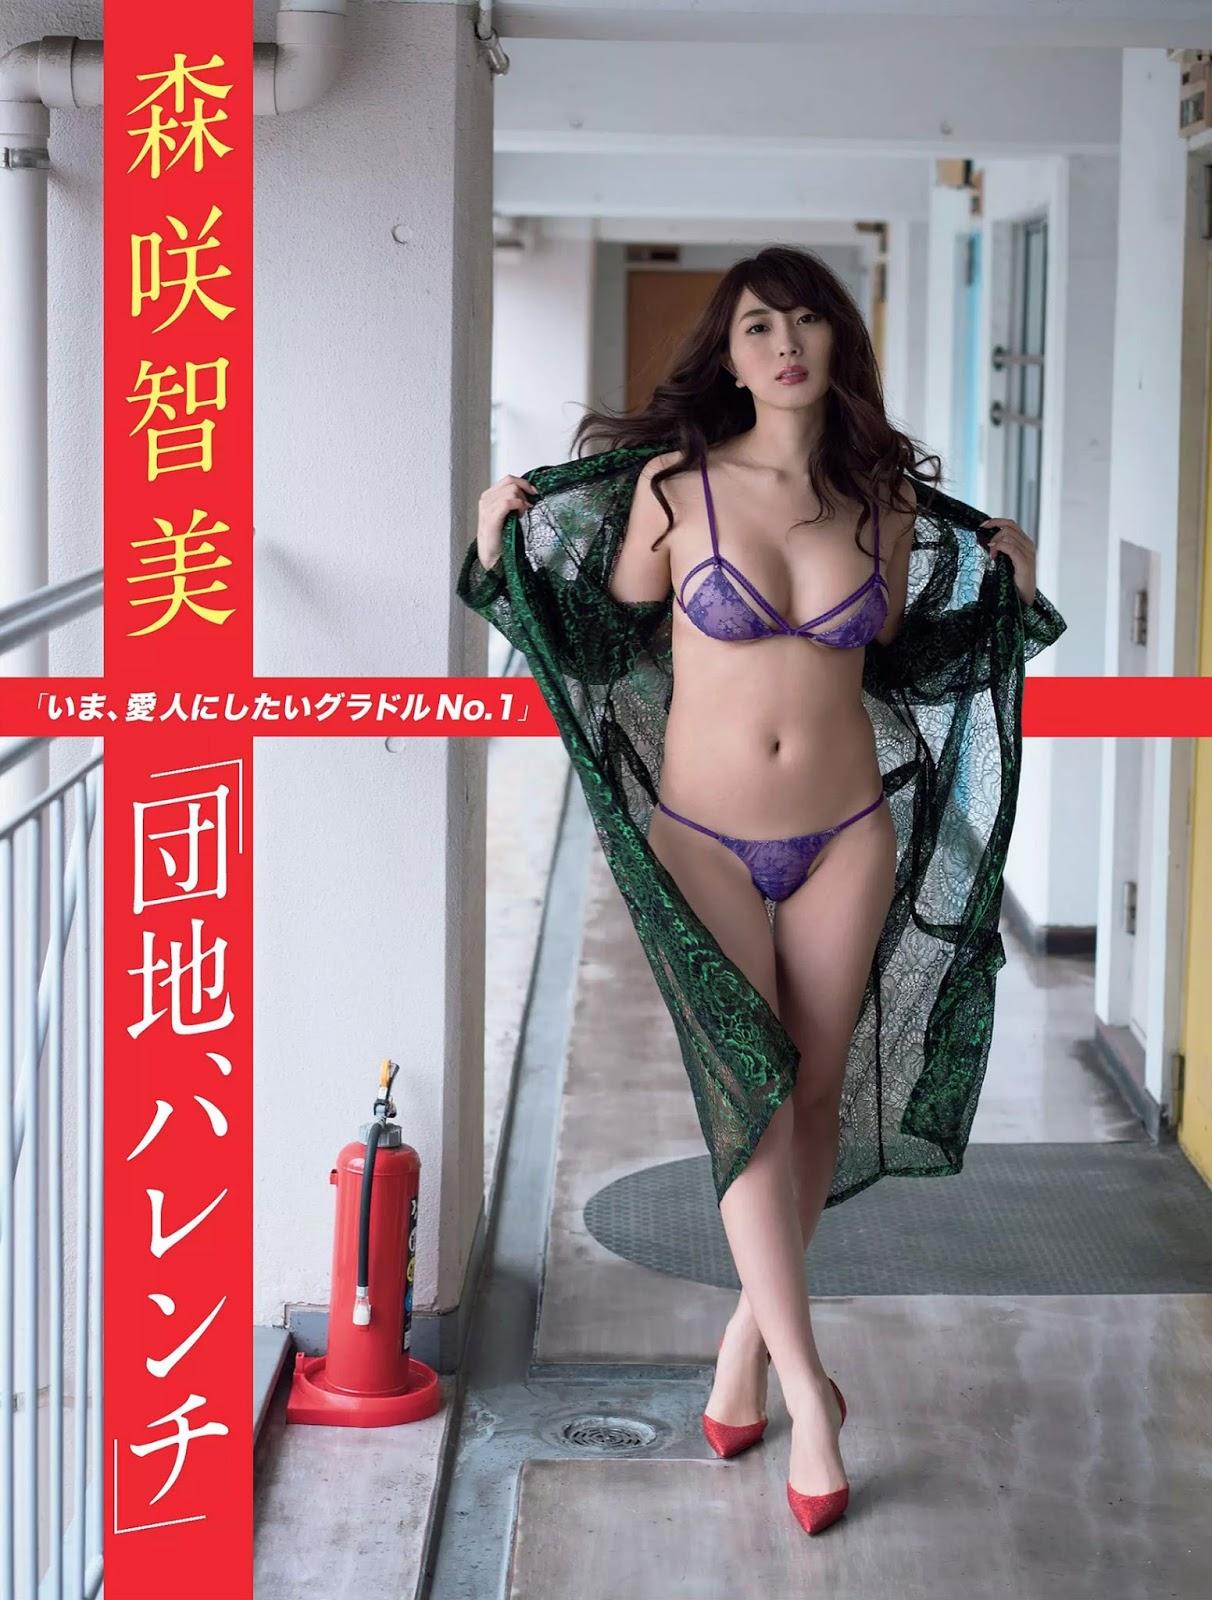 Tomomi Morisaki 森咲智美, FLASH 電子版 2017.11.21 (フラッシュ 2017年11月21日号)